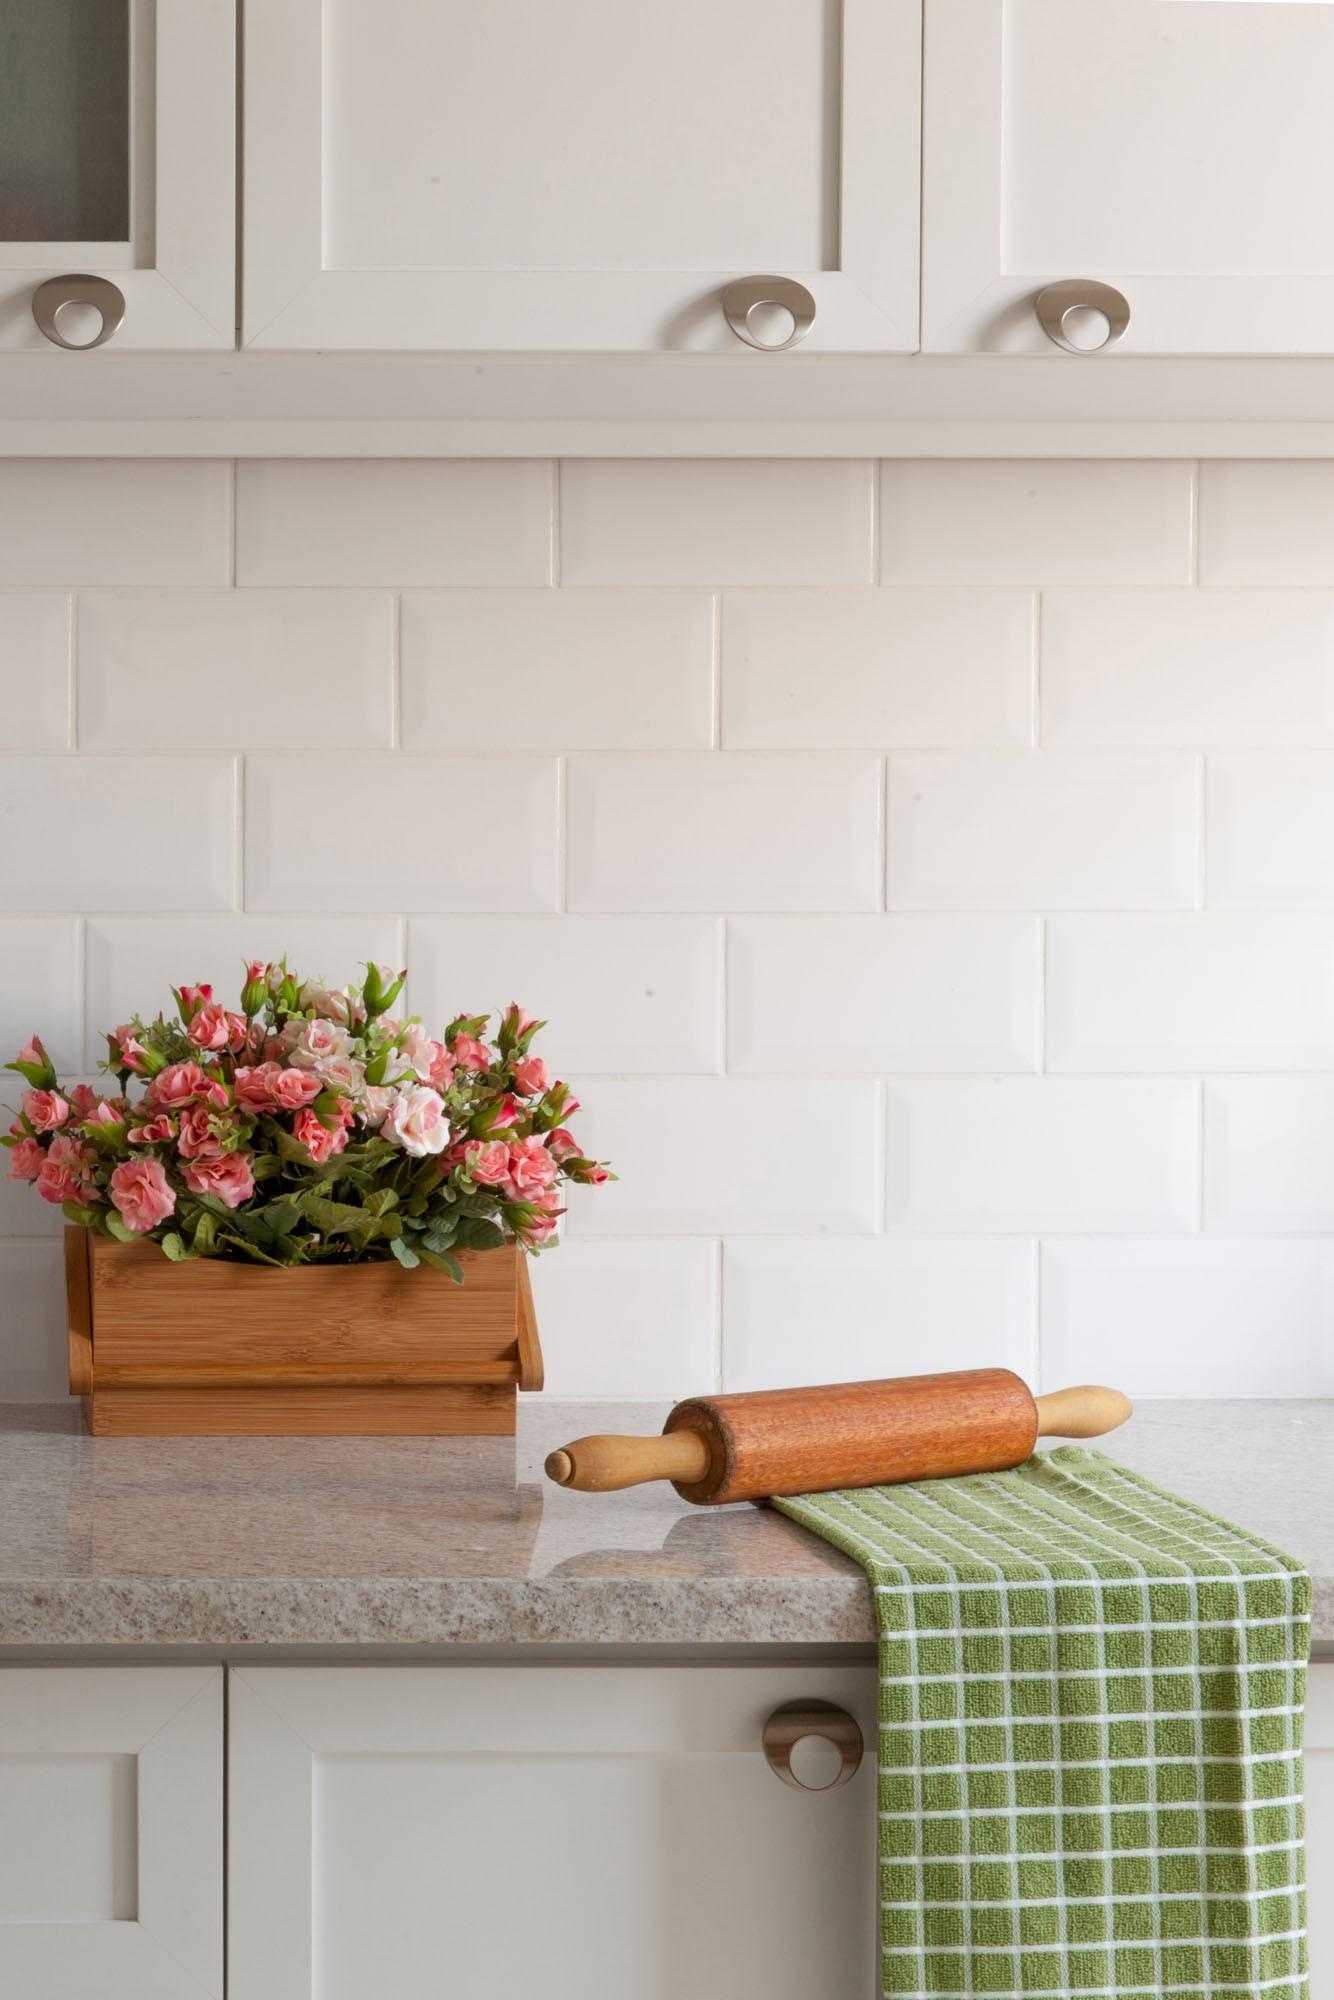 Bancada com revestimento de mármore, rolo de massa, vaso de flor e azulejo metrô branco.